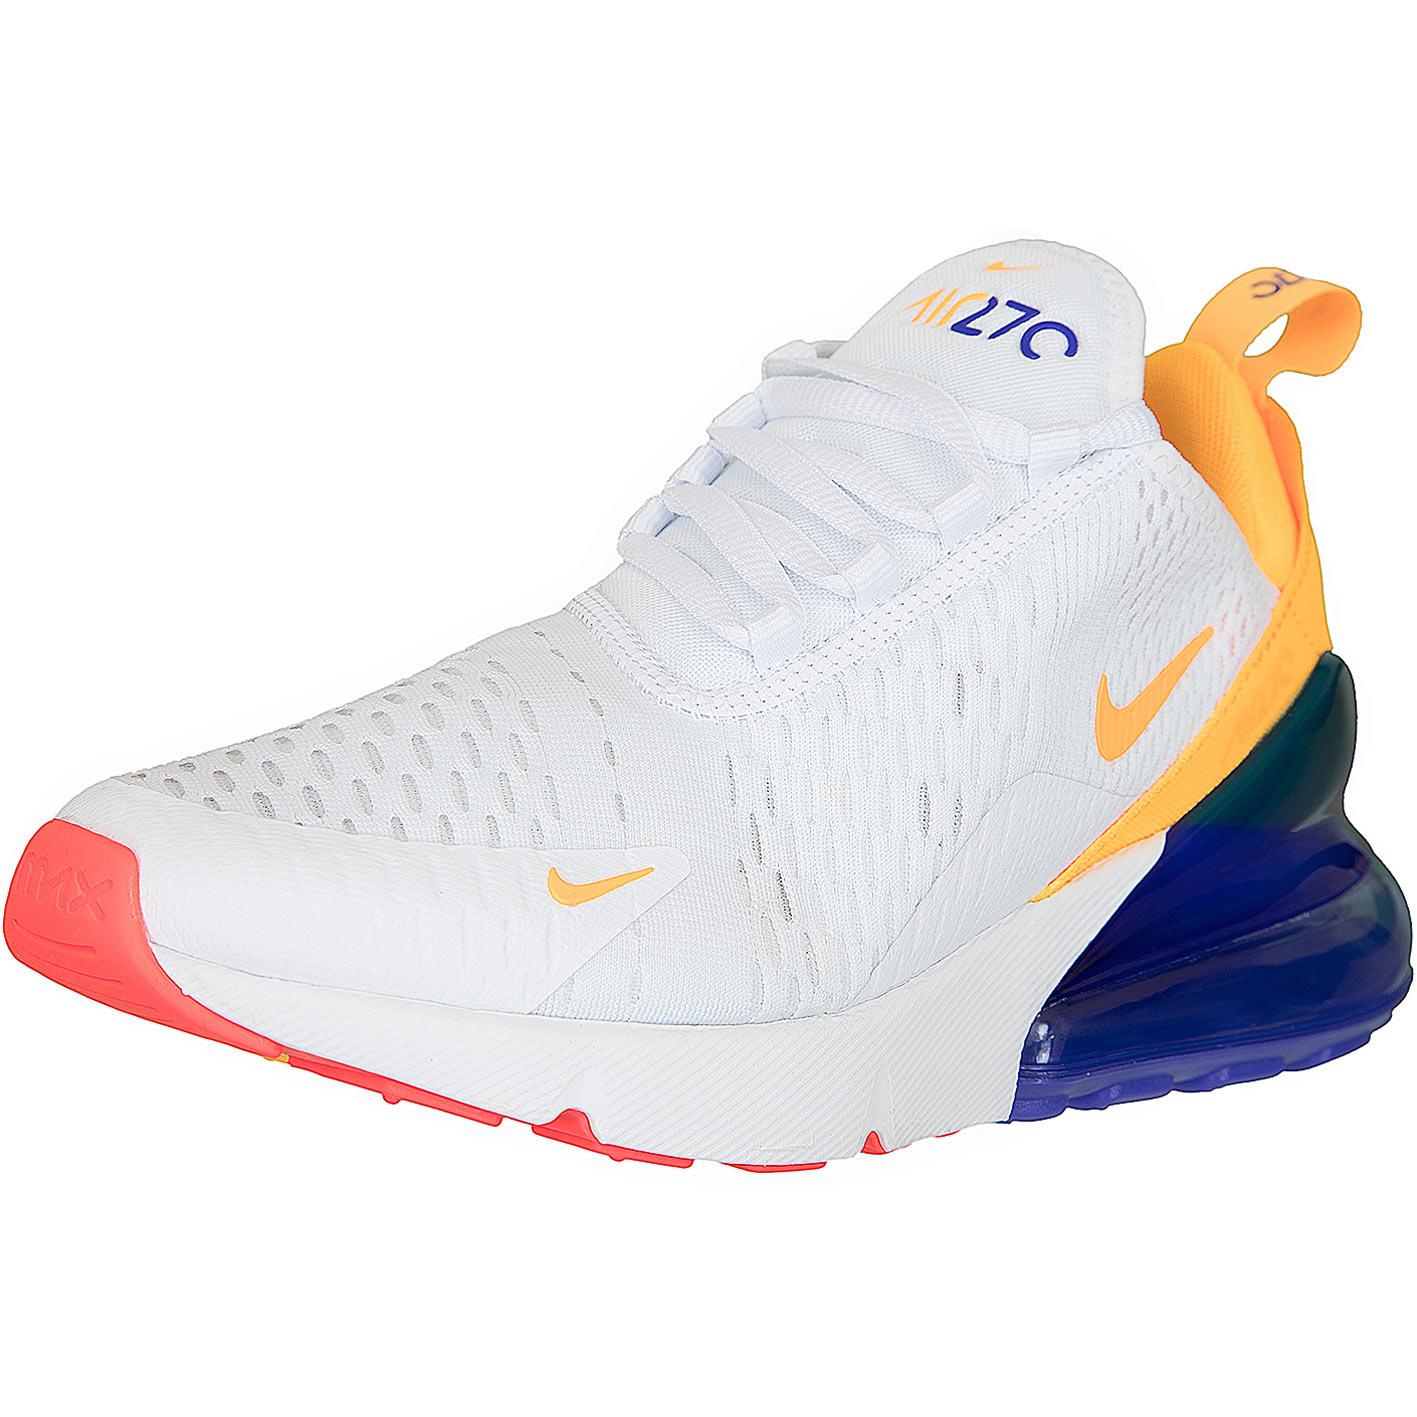 ☆ Nike Damen Sneaker Air Max 270 weißviolett hier bestellen!